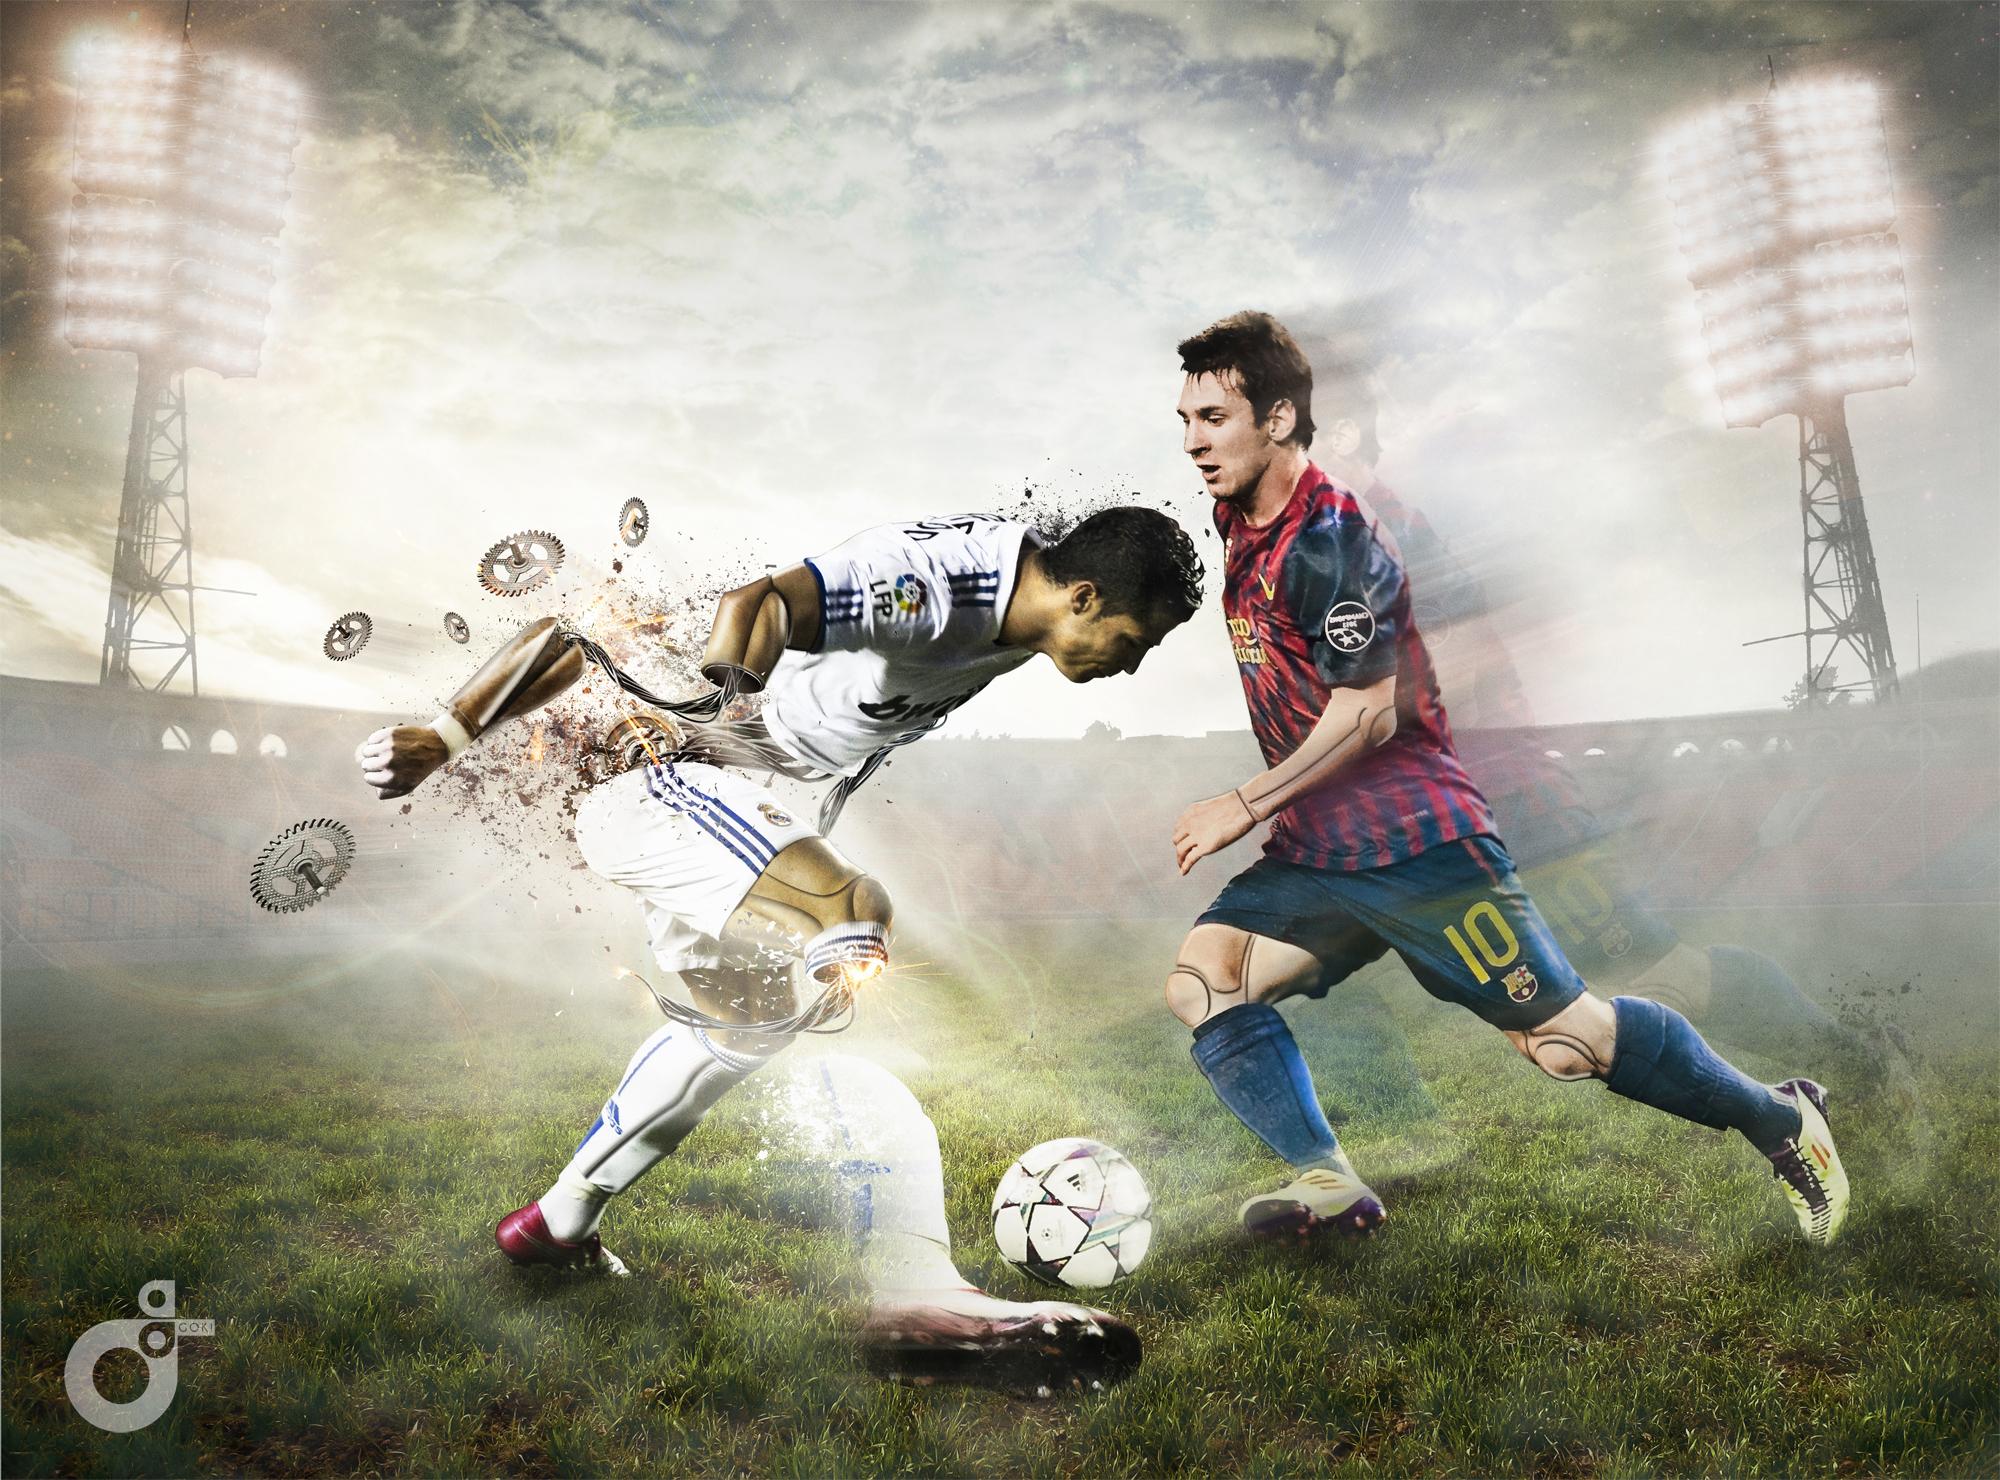 Messi Vs Ronaldo Soccer Wallpaper   Football HD Wallpapers 2000x1480